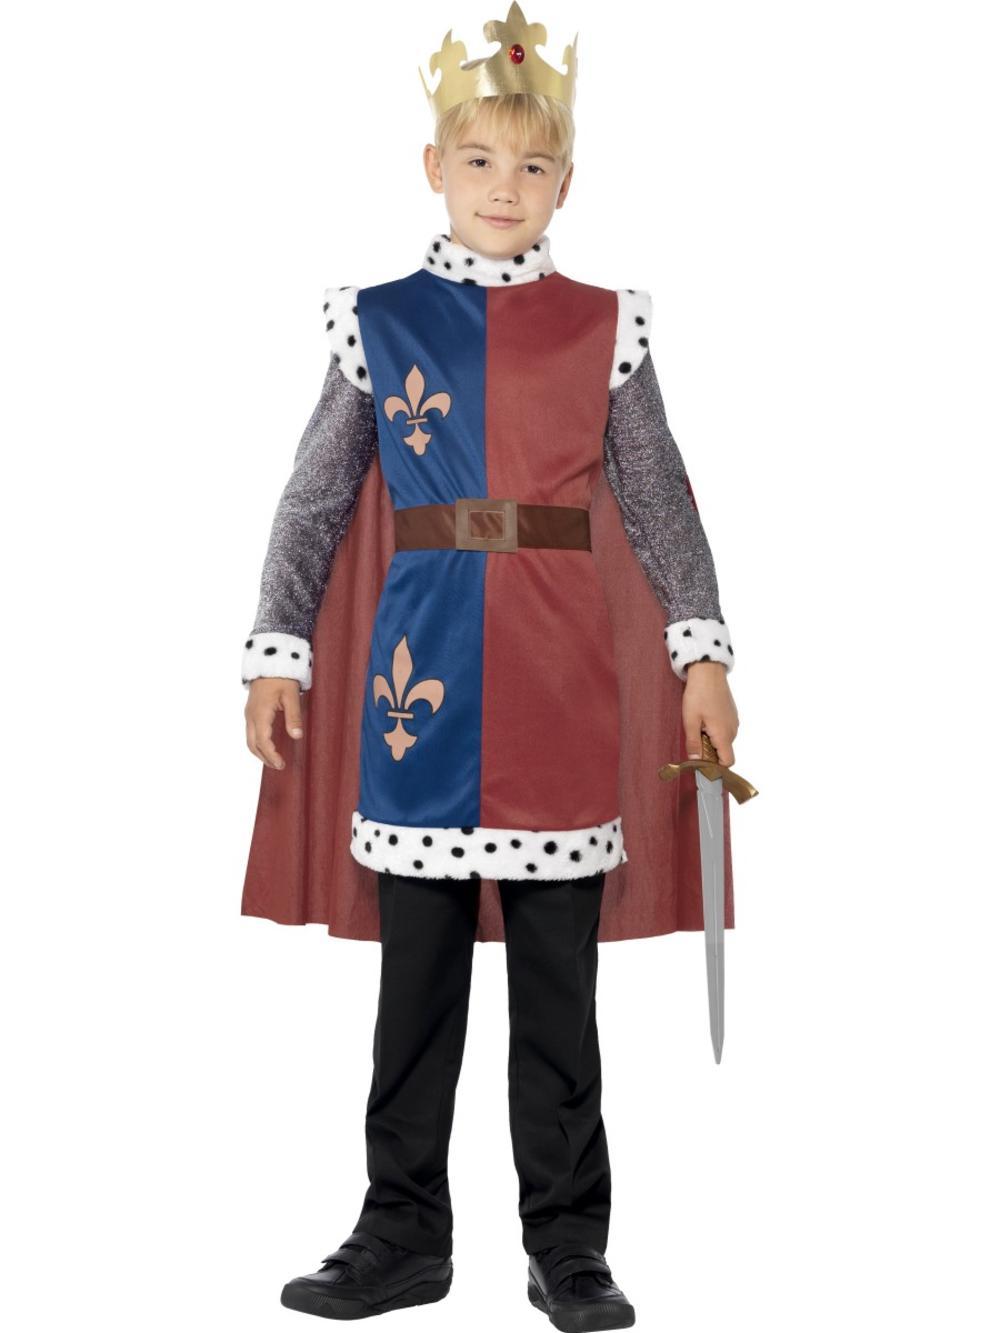 King Arthur Boys Fancy Dress Medieval Historic Nativity Childs Kids Costume New